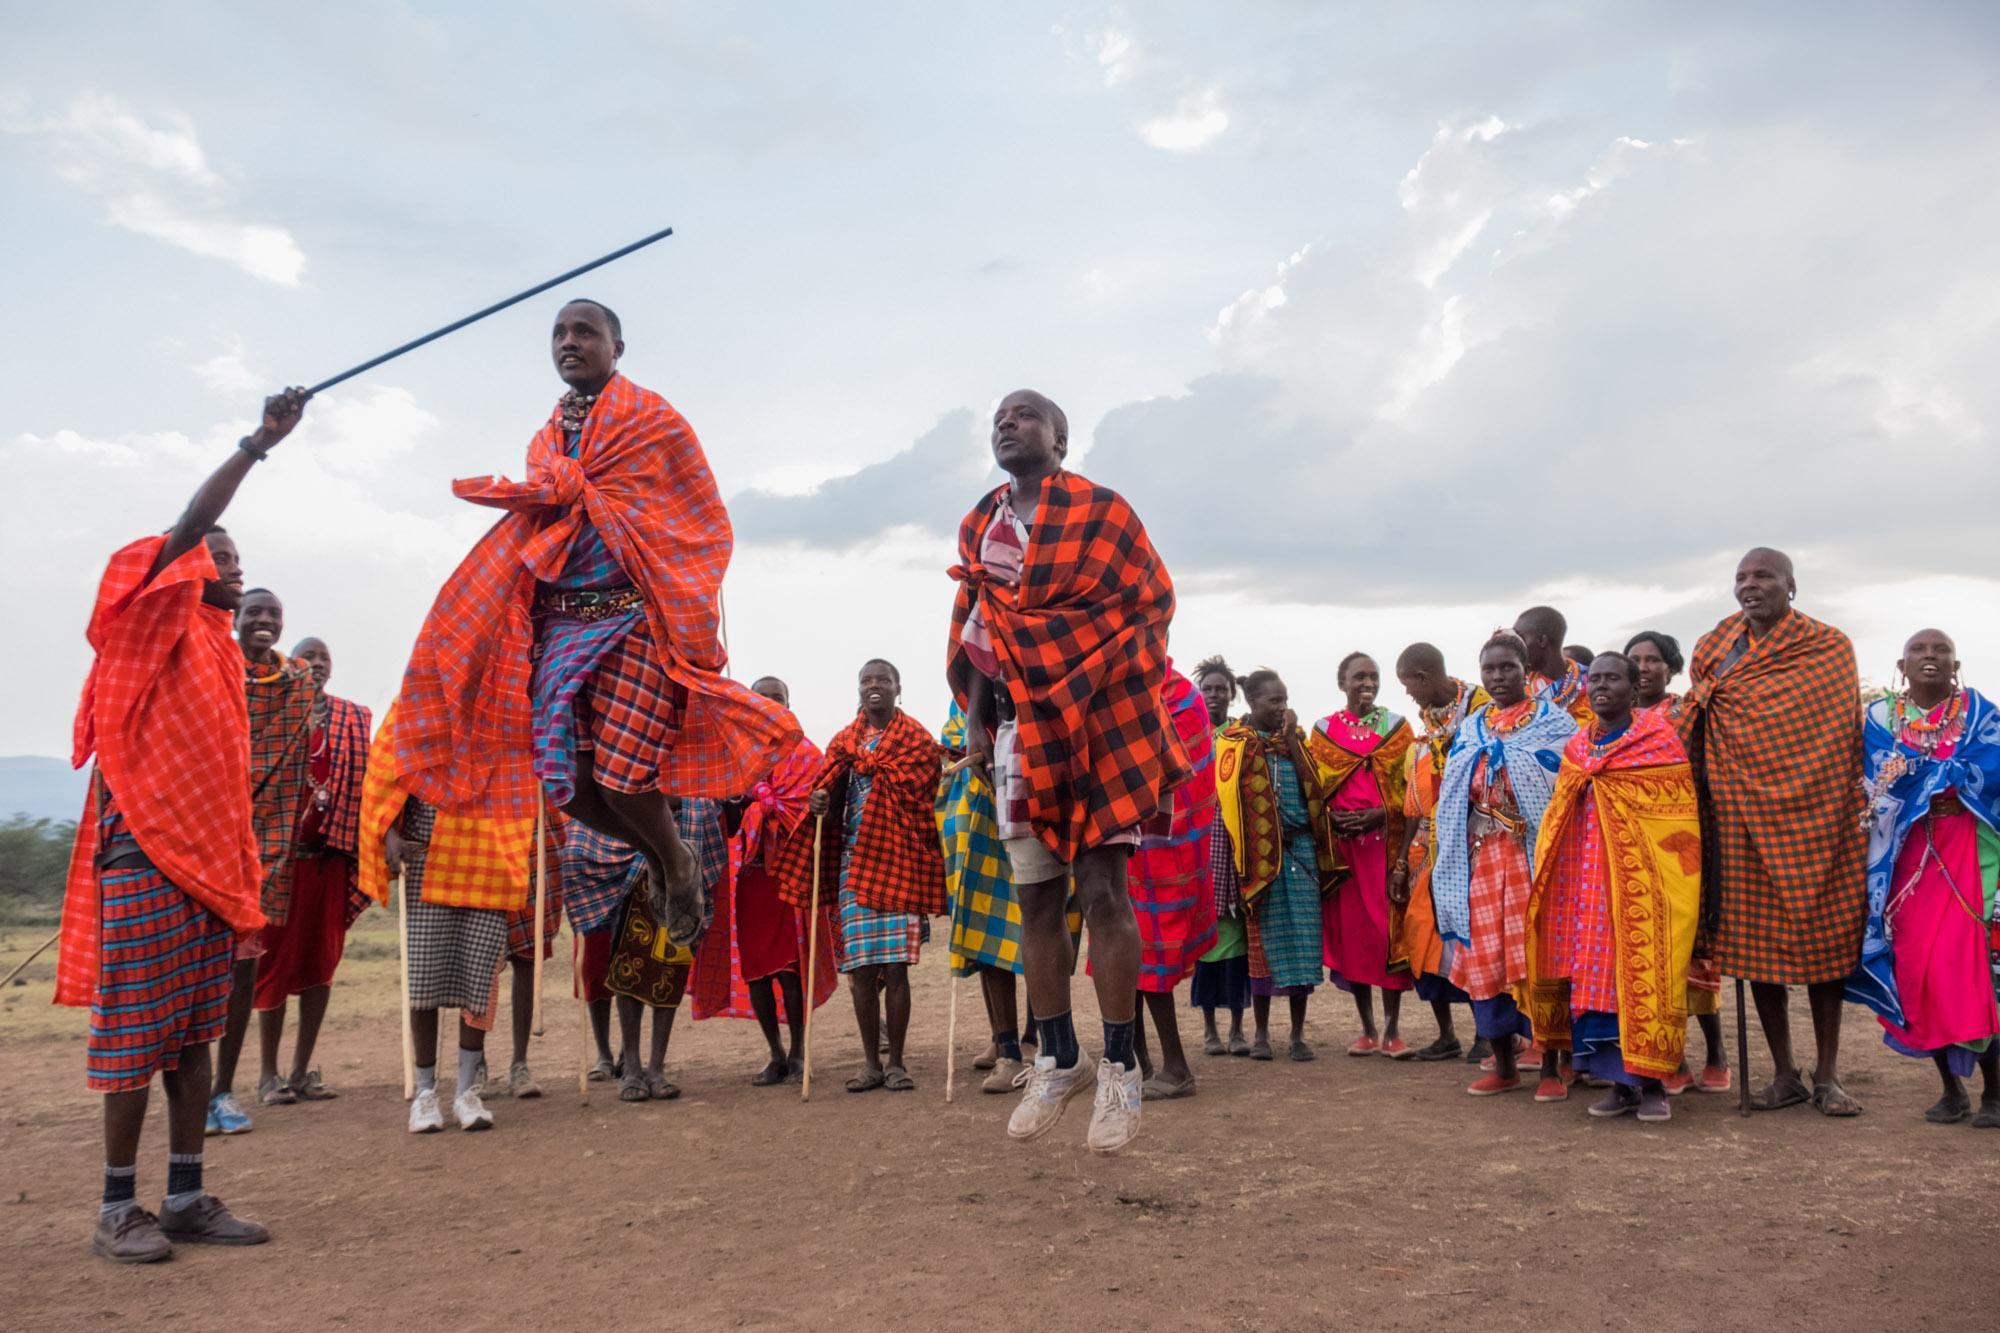 maasai-leap-bogani-we-kenya-2018-01-01.jpg